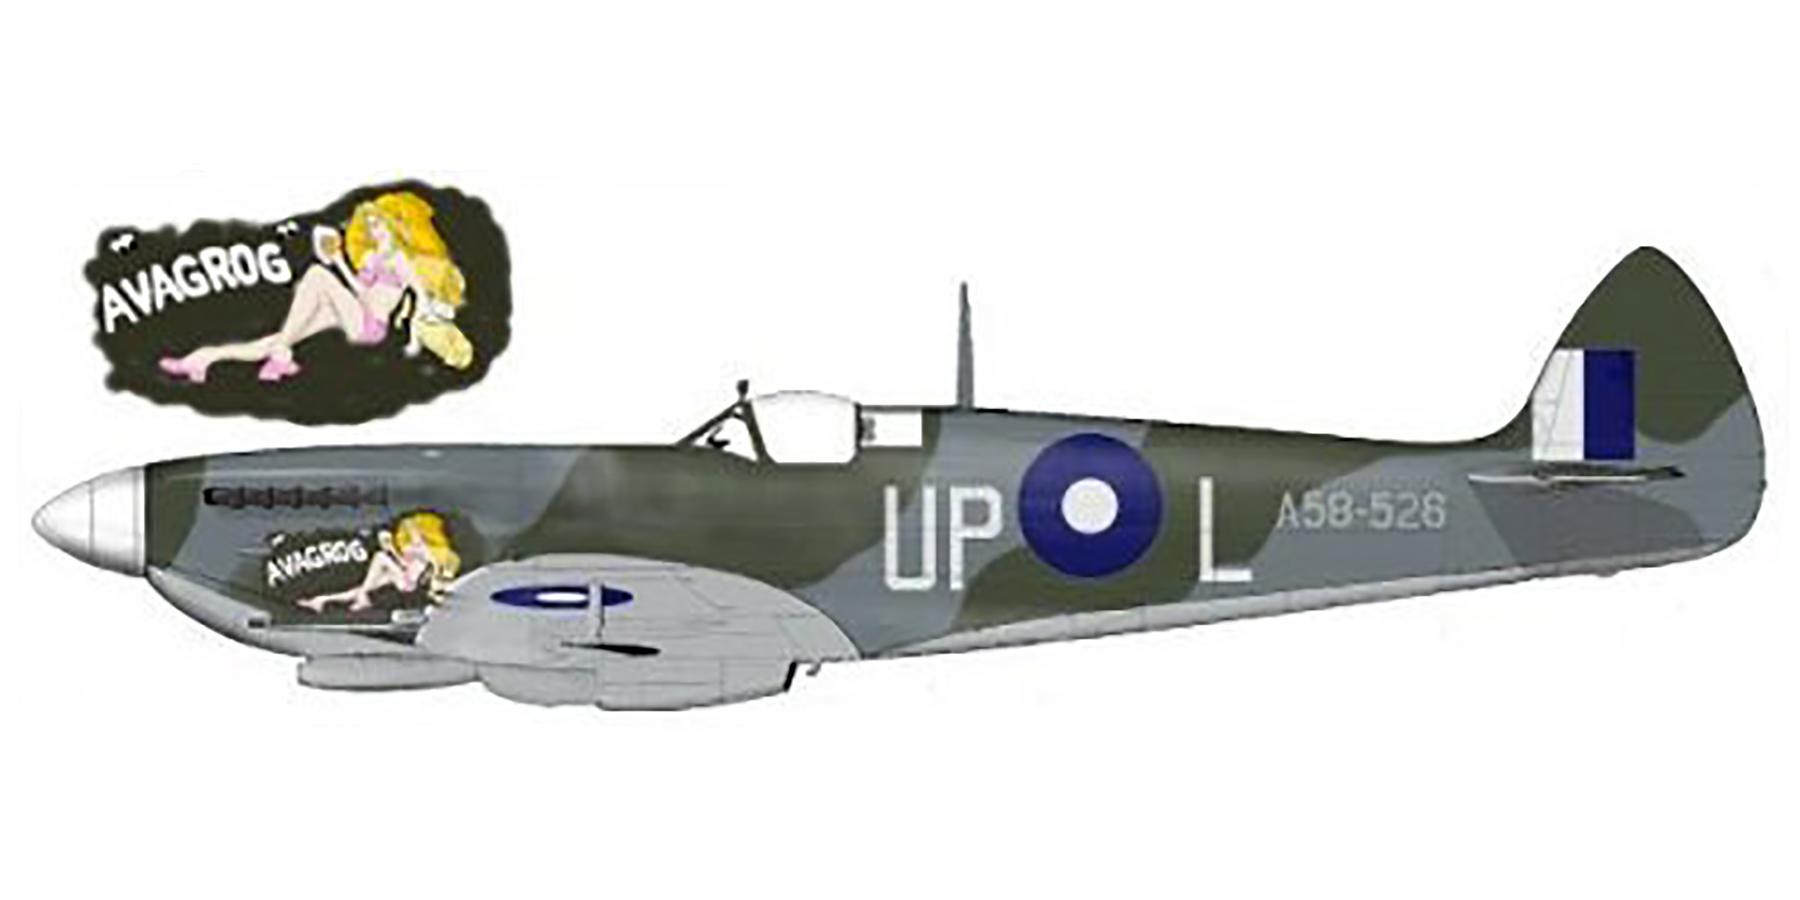 Spitfire LFVIII RAAF 79Sqn UPL A58 526 Morotai 1945 0A